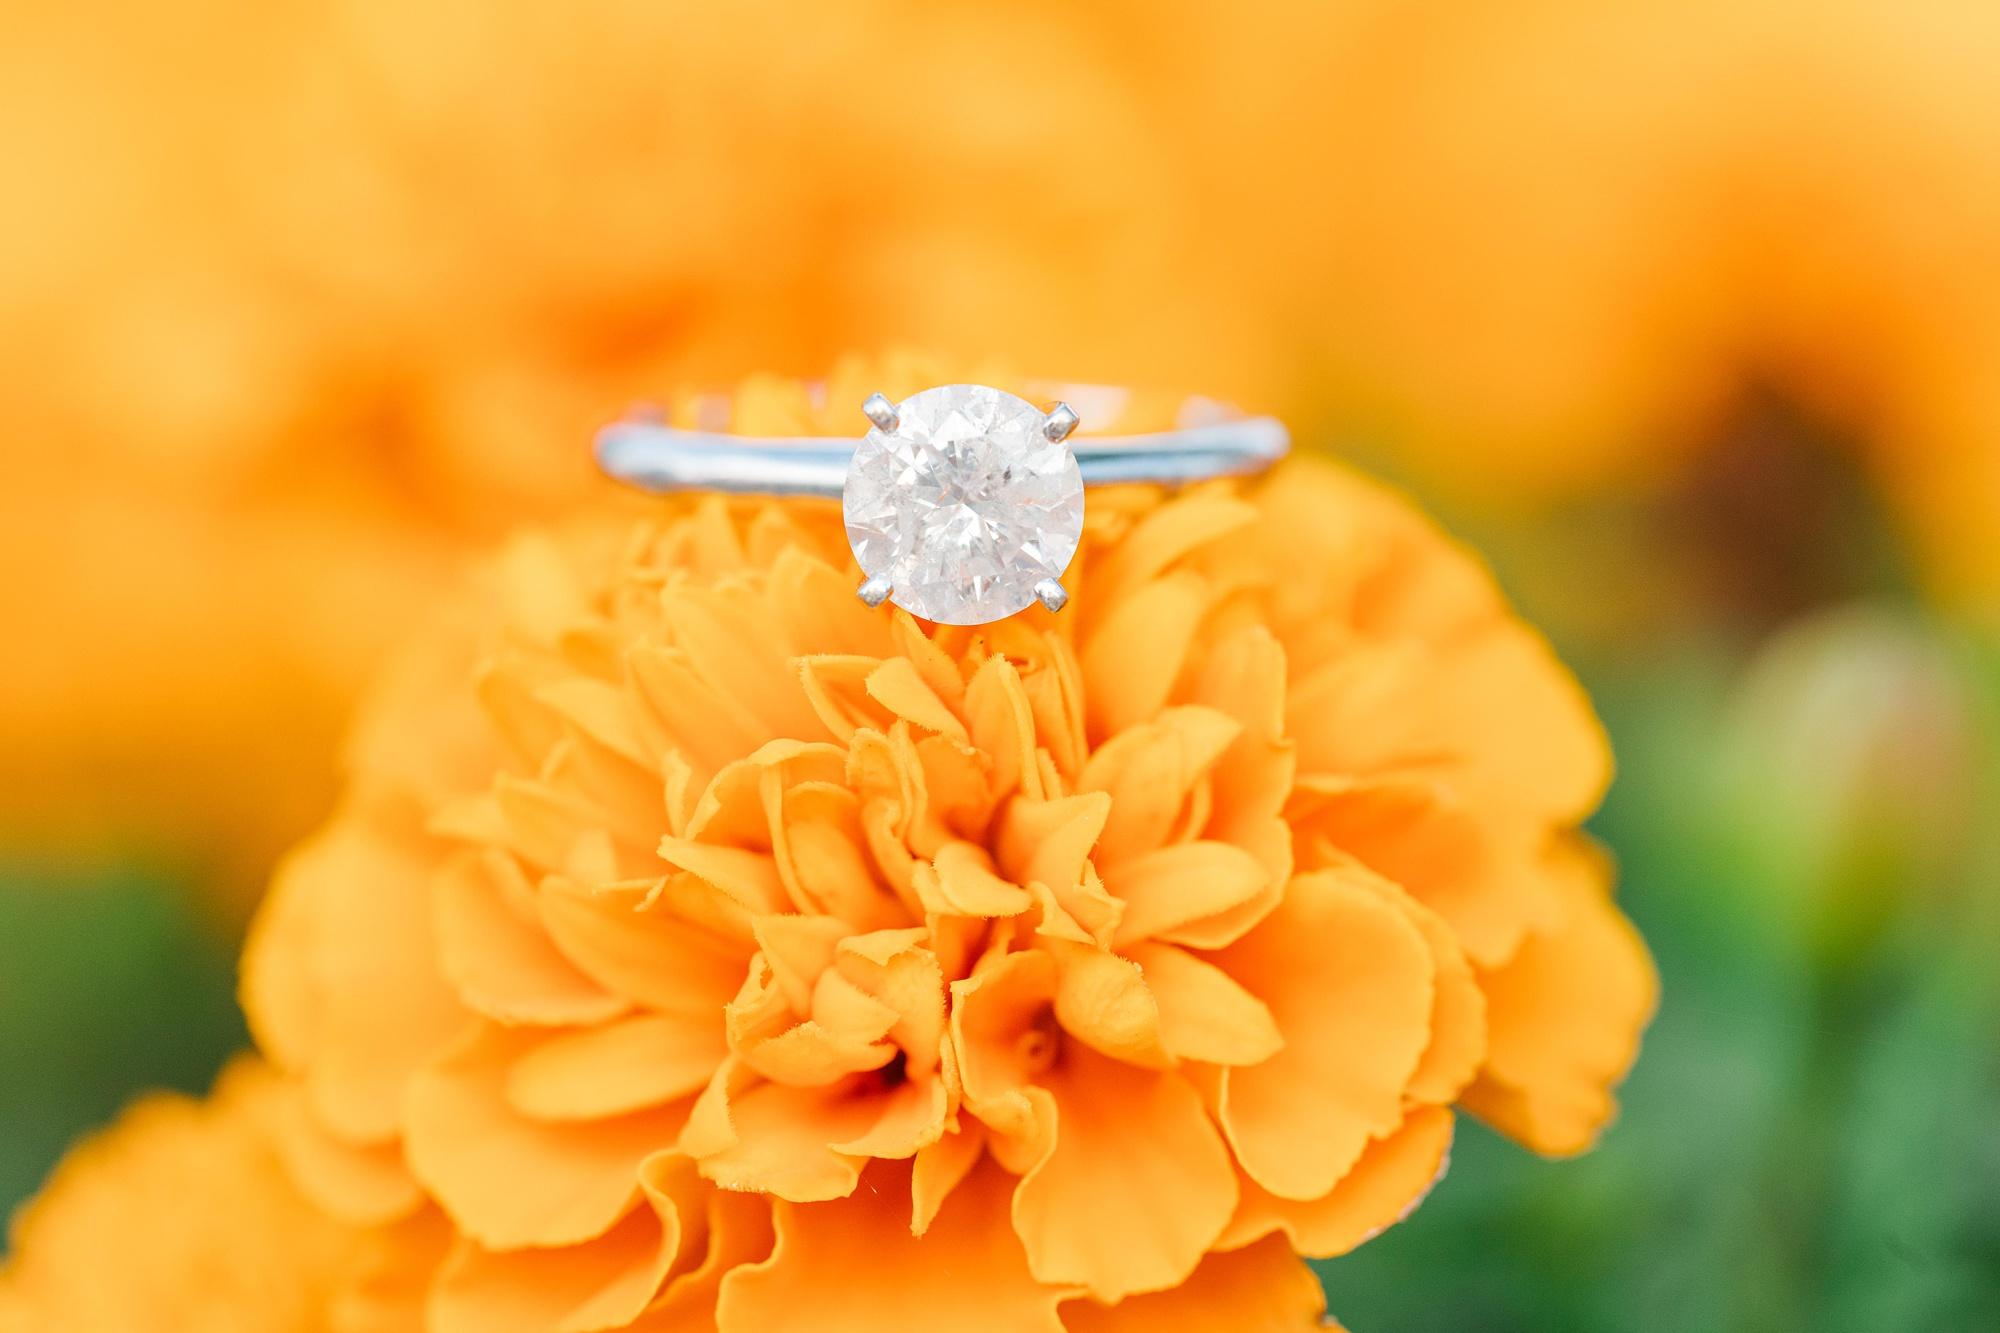 engagement ring on orange flower in Alabama town